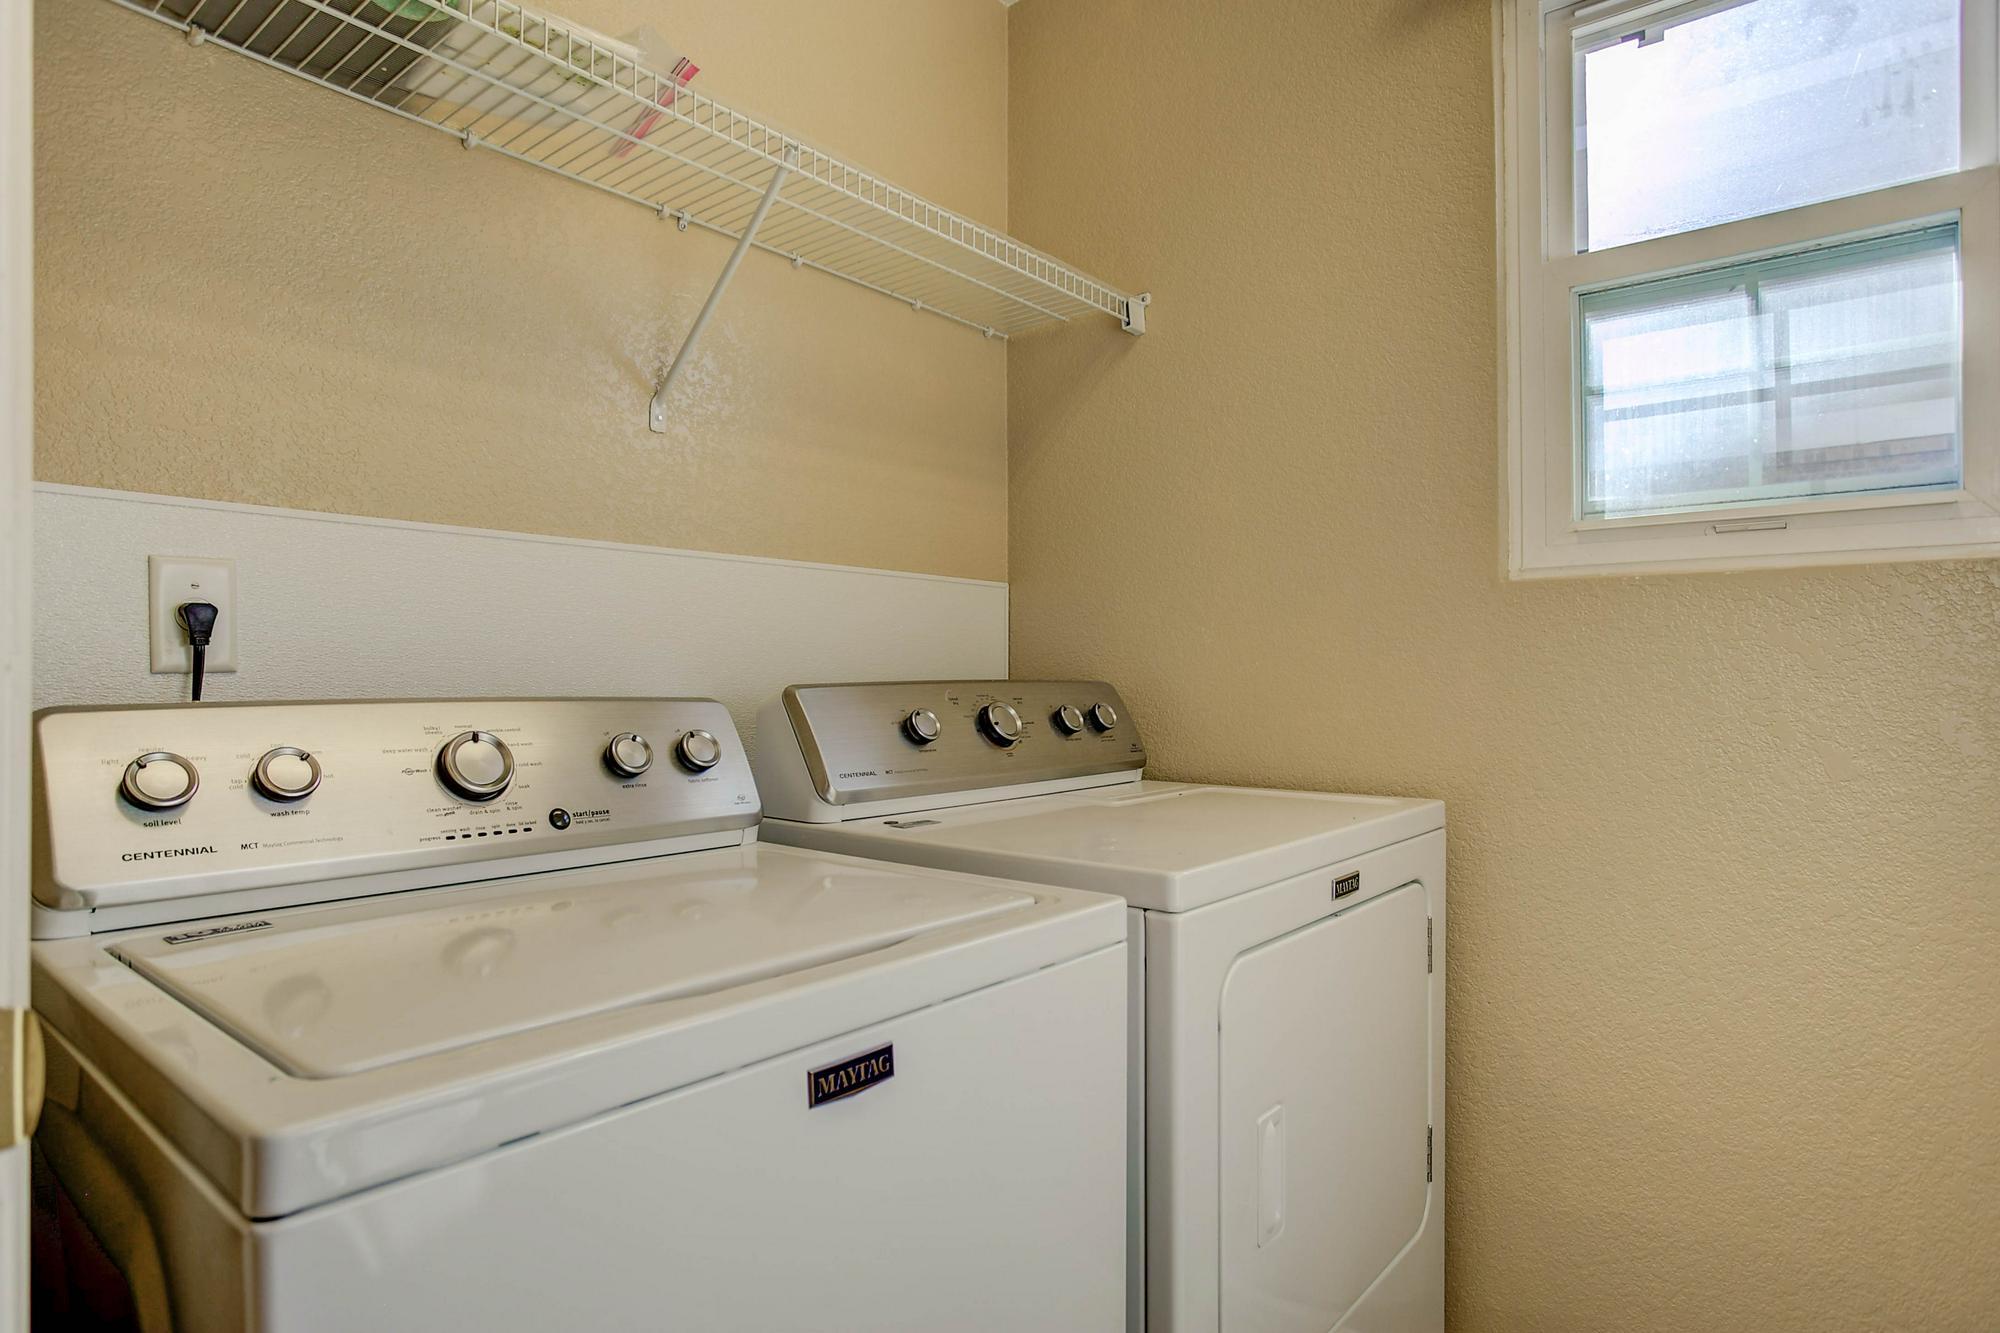 Listassistimage-298778-web_ready-20344%2beast%2bvassar%2bavenue_laundry-2000x2000